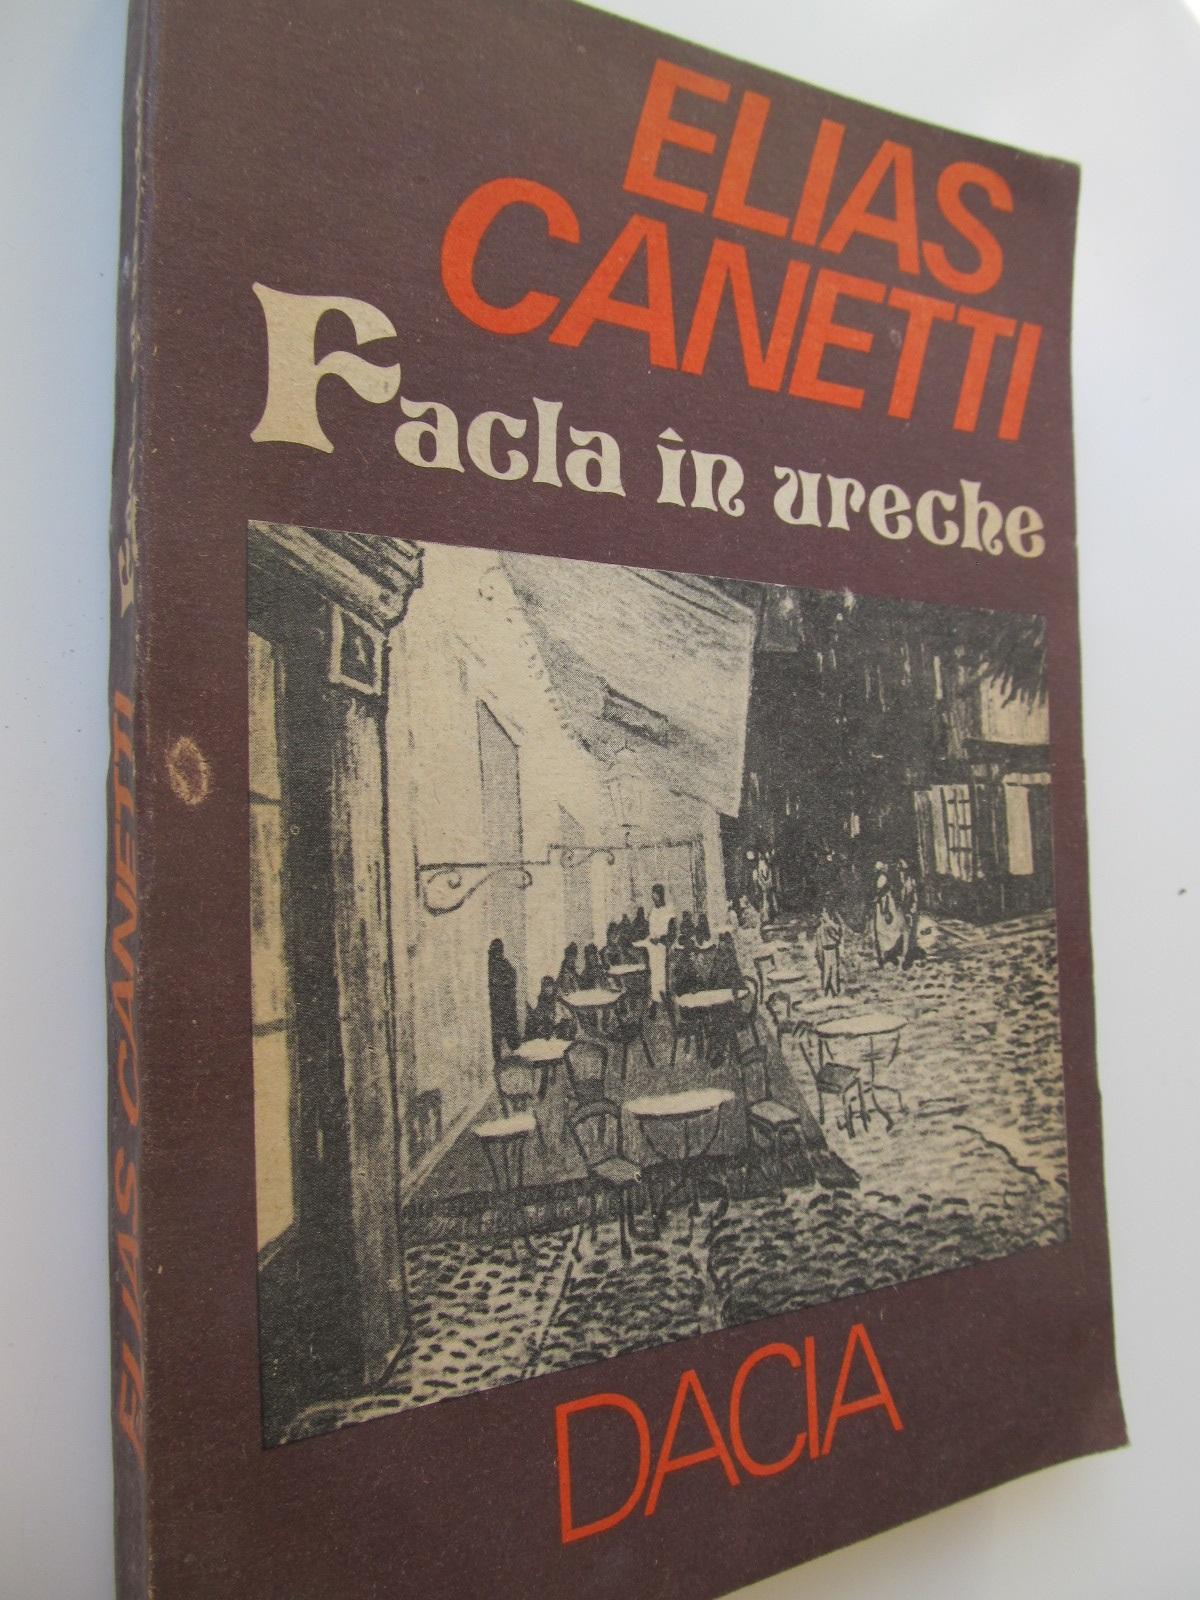 Facla in ureche - Elias Canetti | Detalii carte